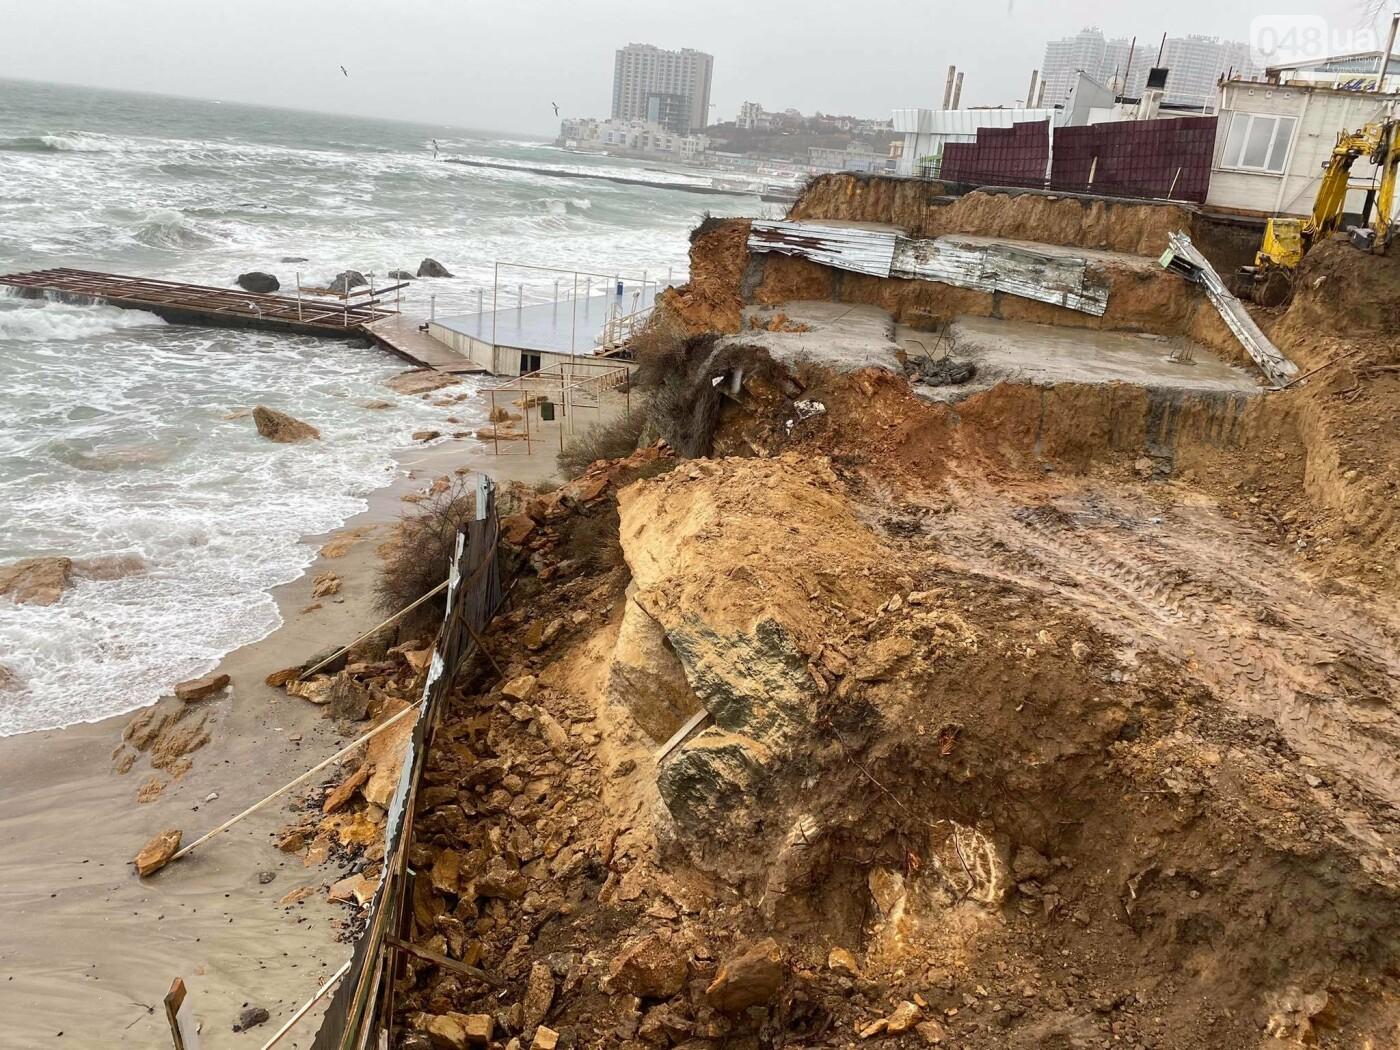 В Аркадии на побережье активист нашел незаконную стройку,- ФОТО, ВИДЕО, фото-6